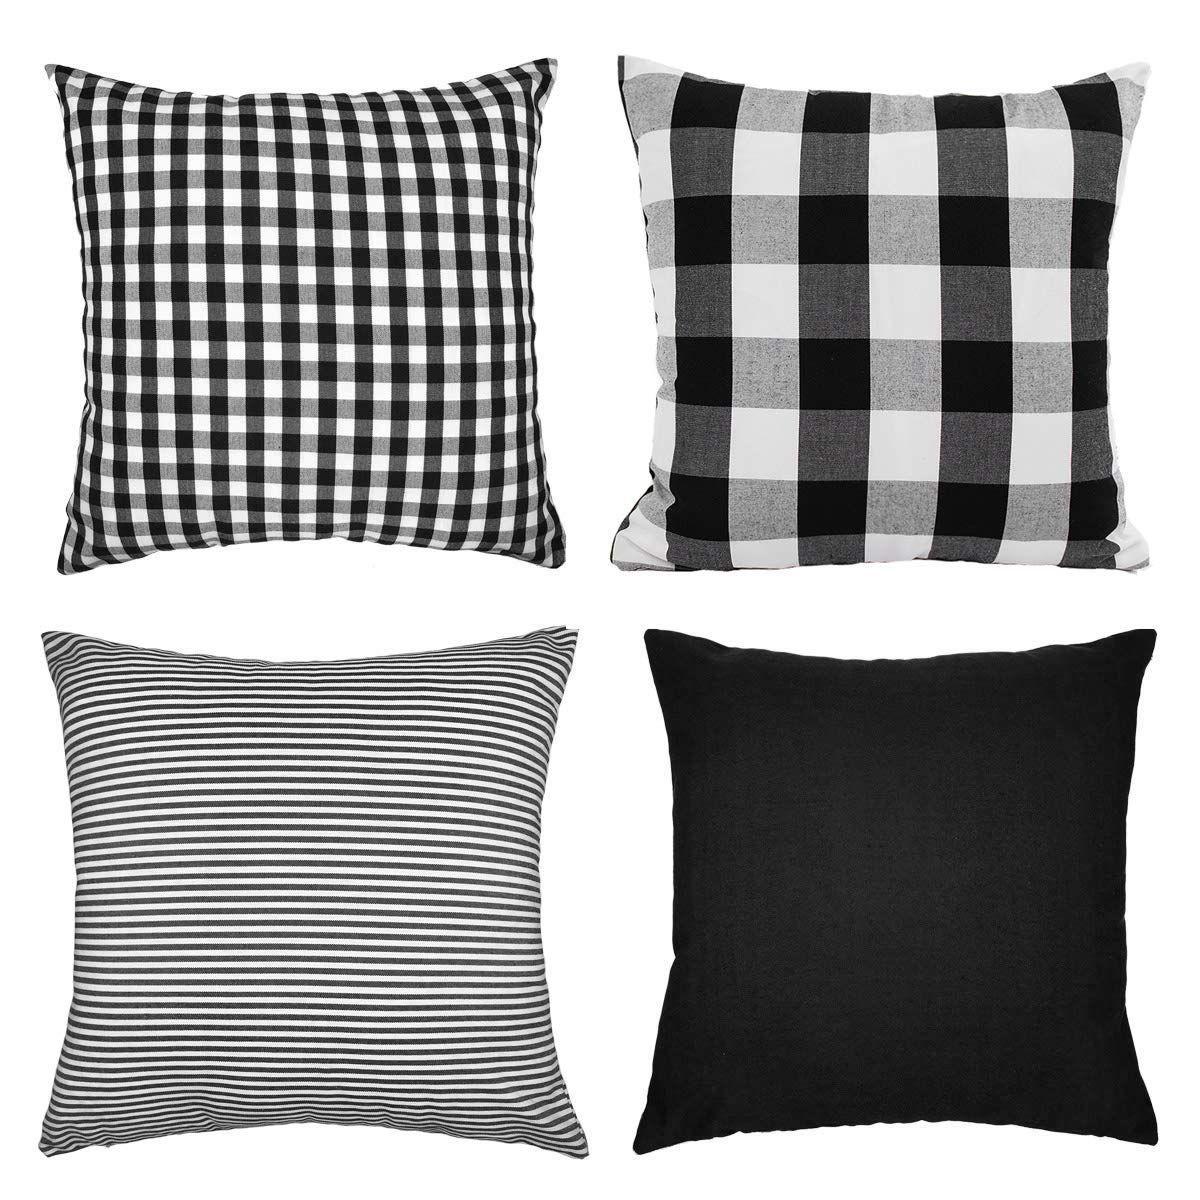 Buffalo Check: Black & White Year-Round Home Decor Ideas images